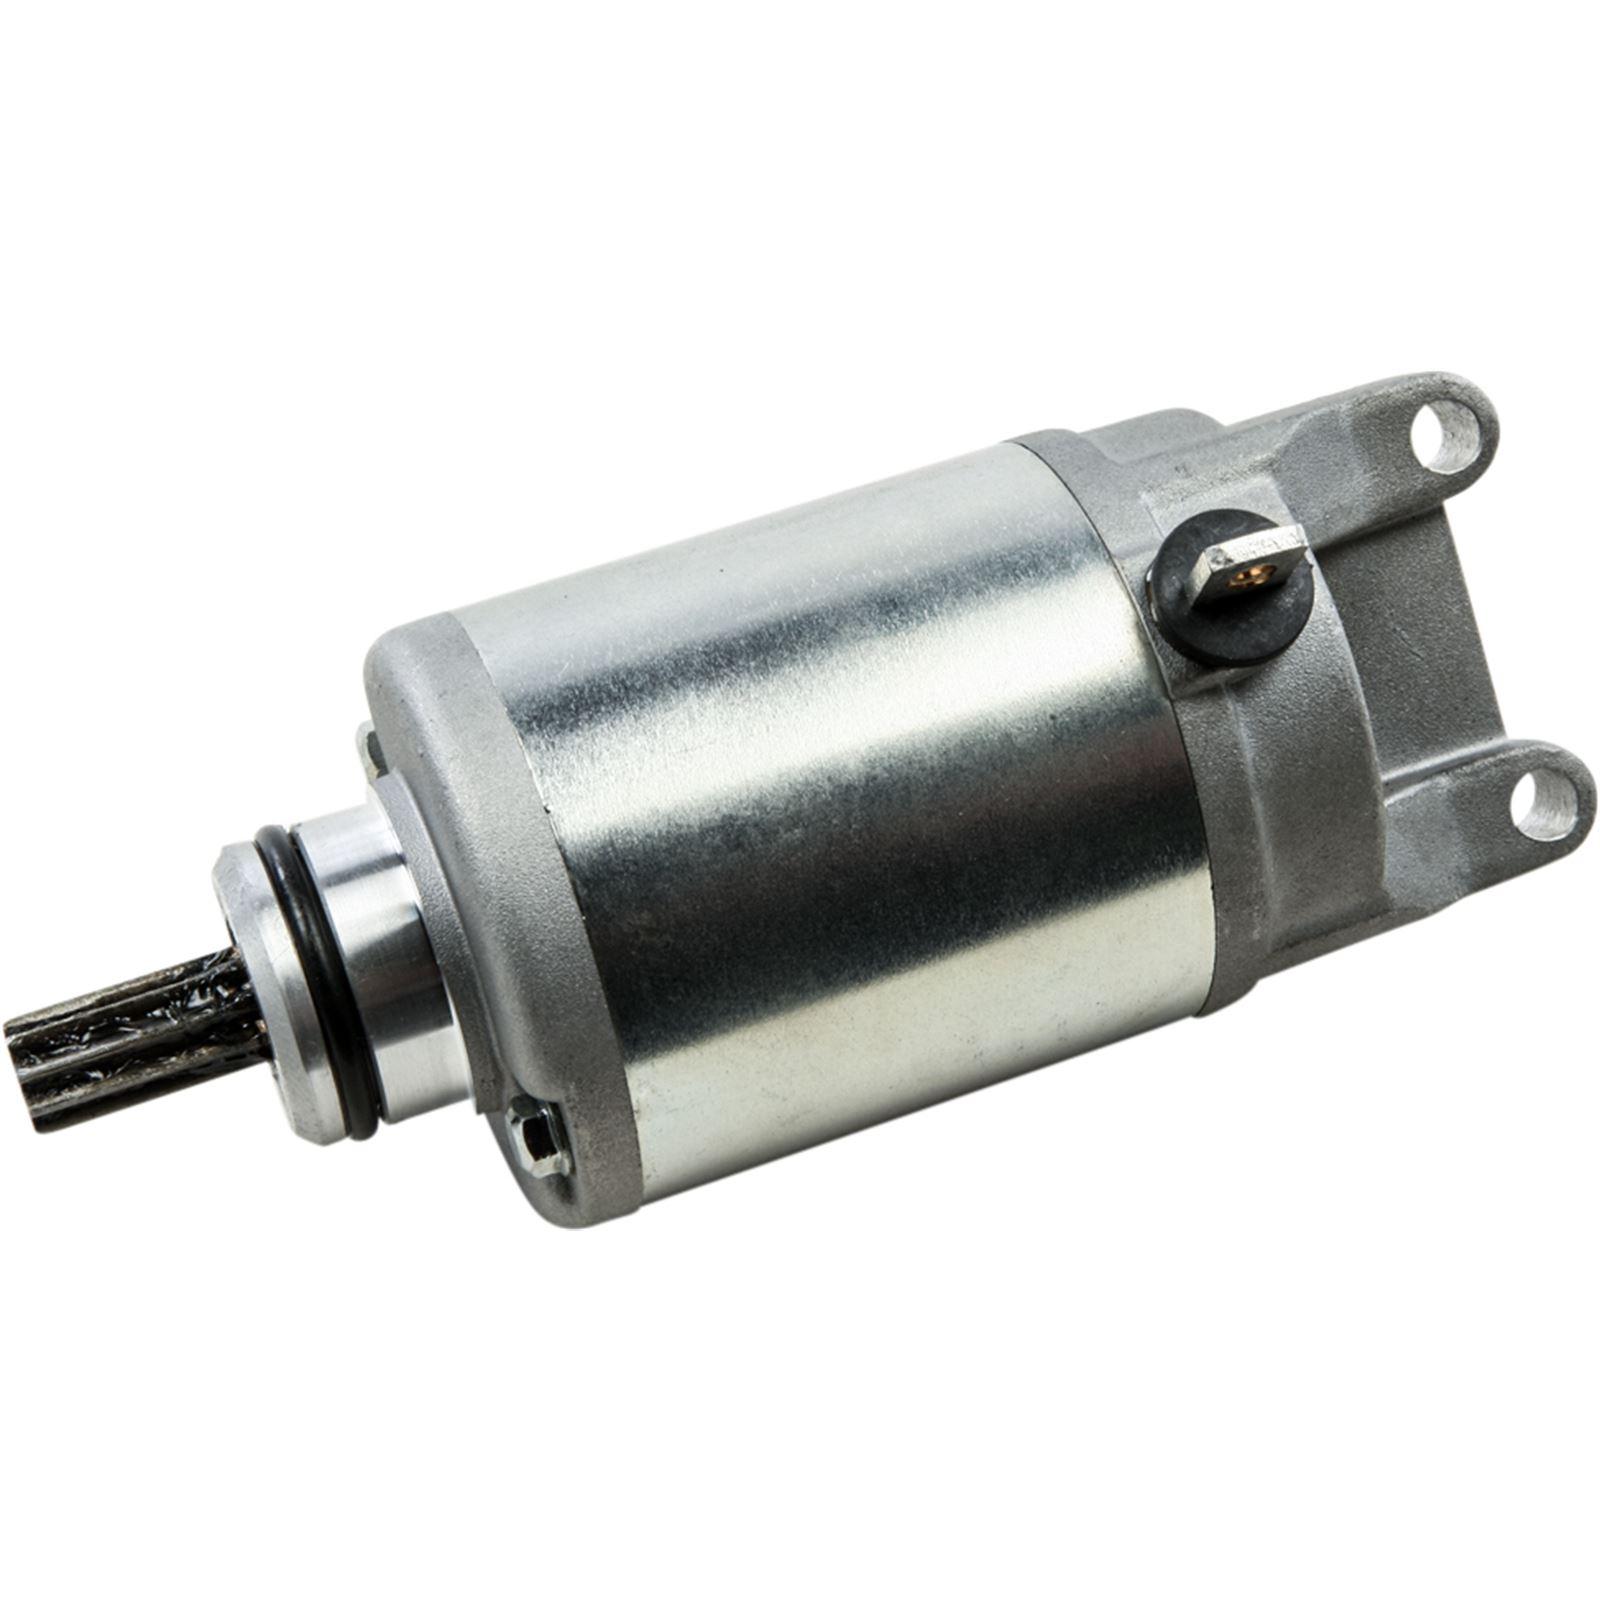 Fire Power Starter Motor